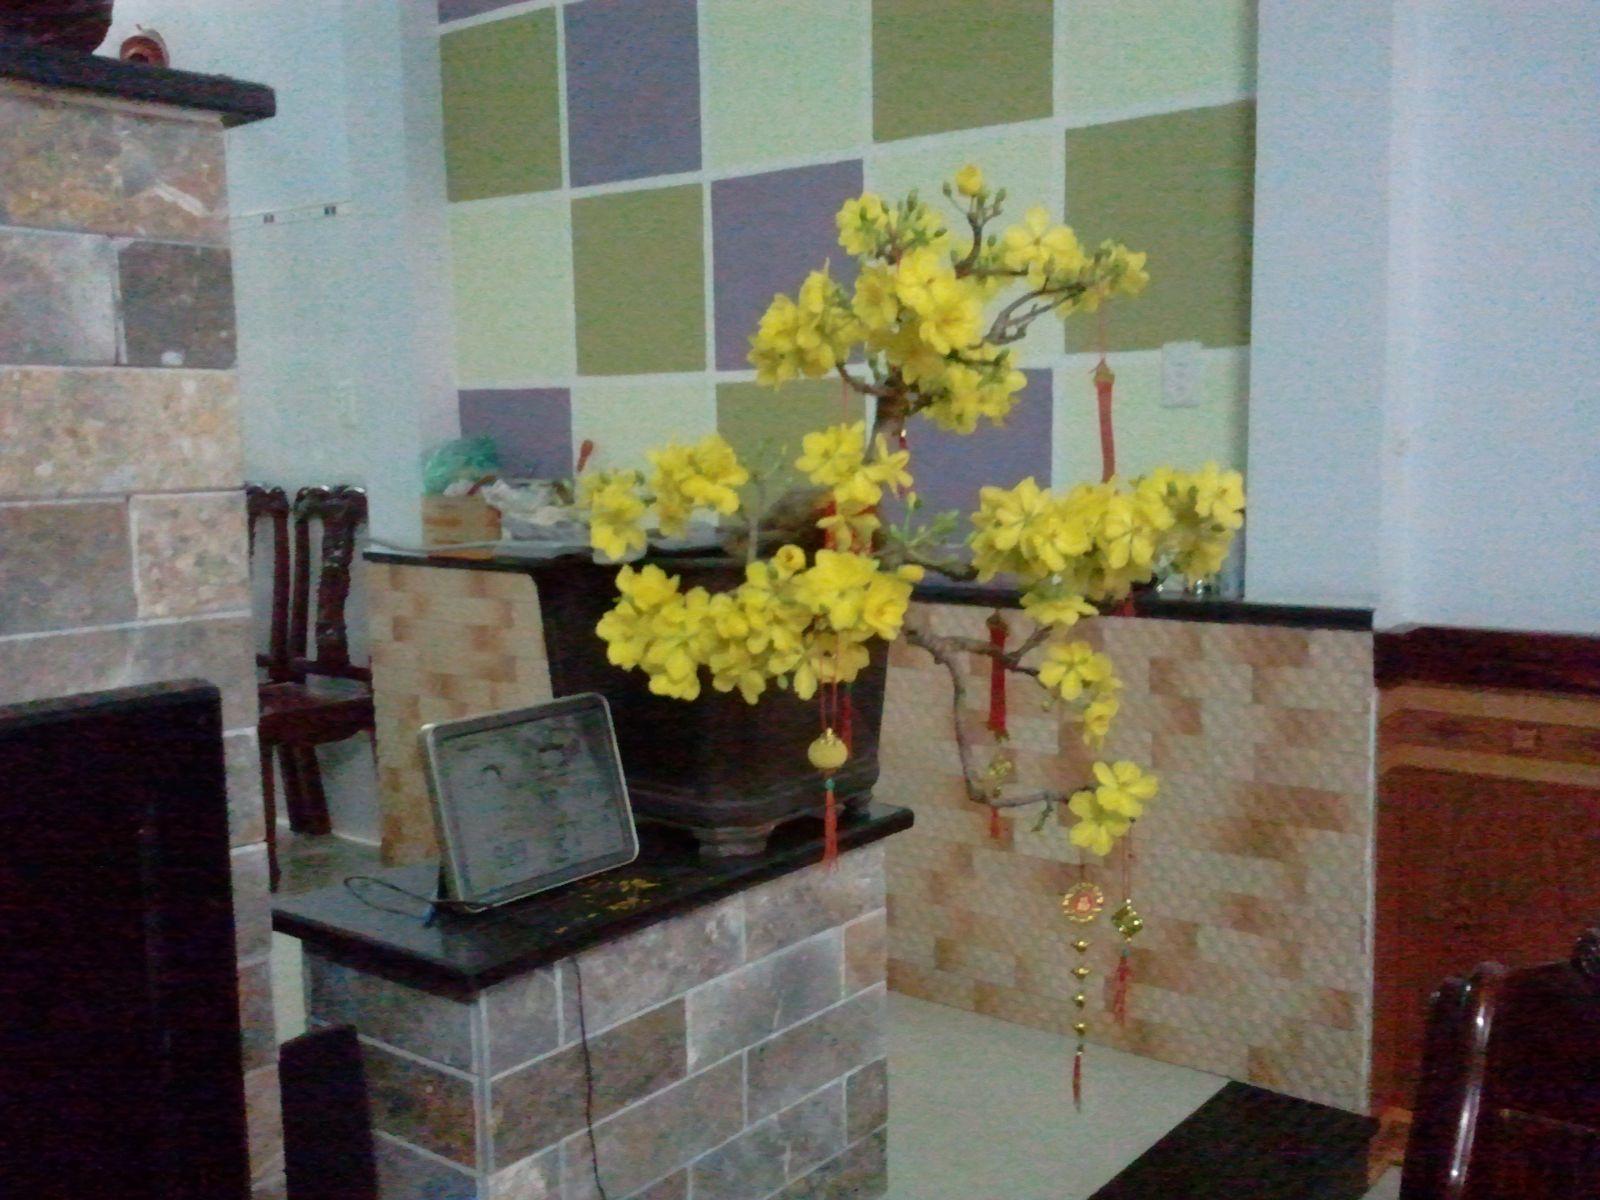 638 - Mai Bonsai nhỏ mùng 1 Tết